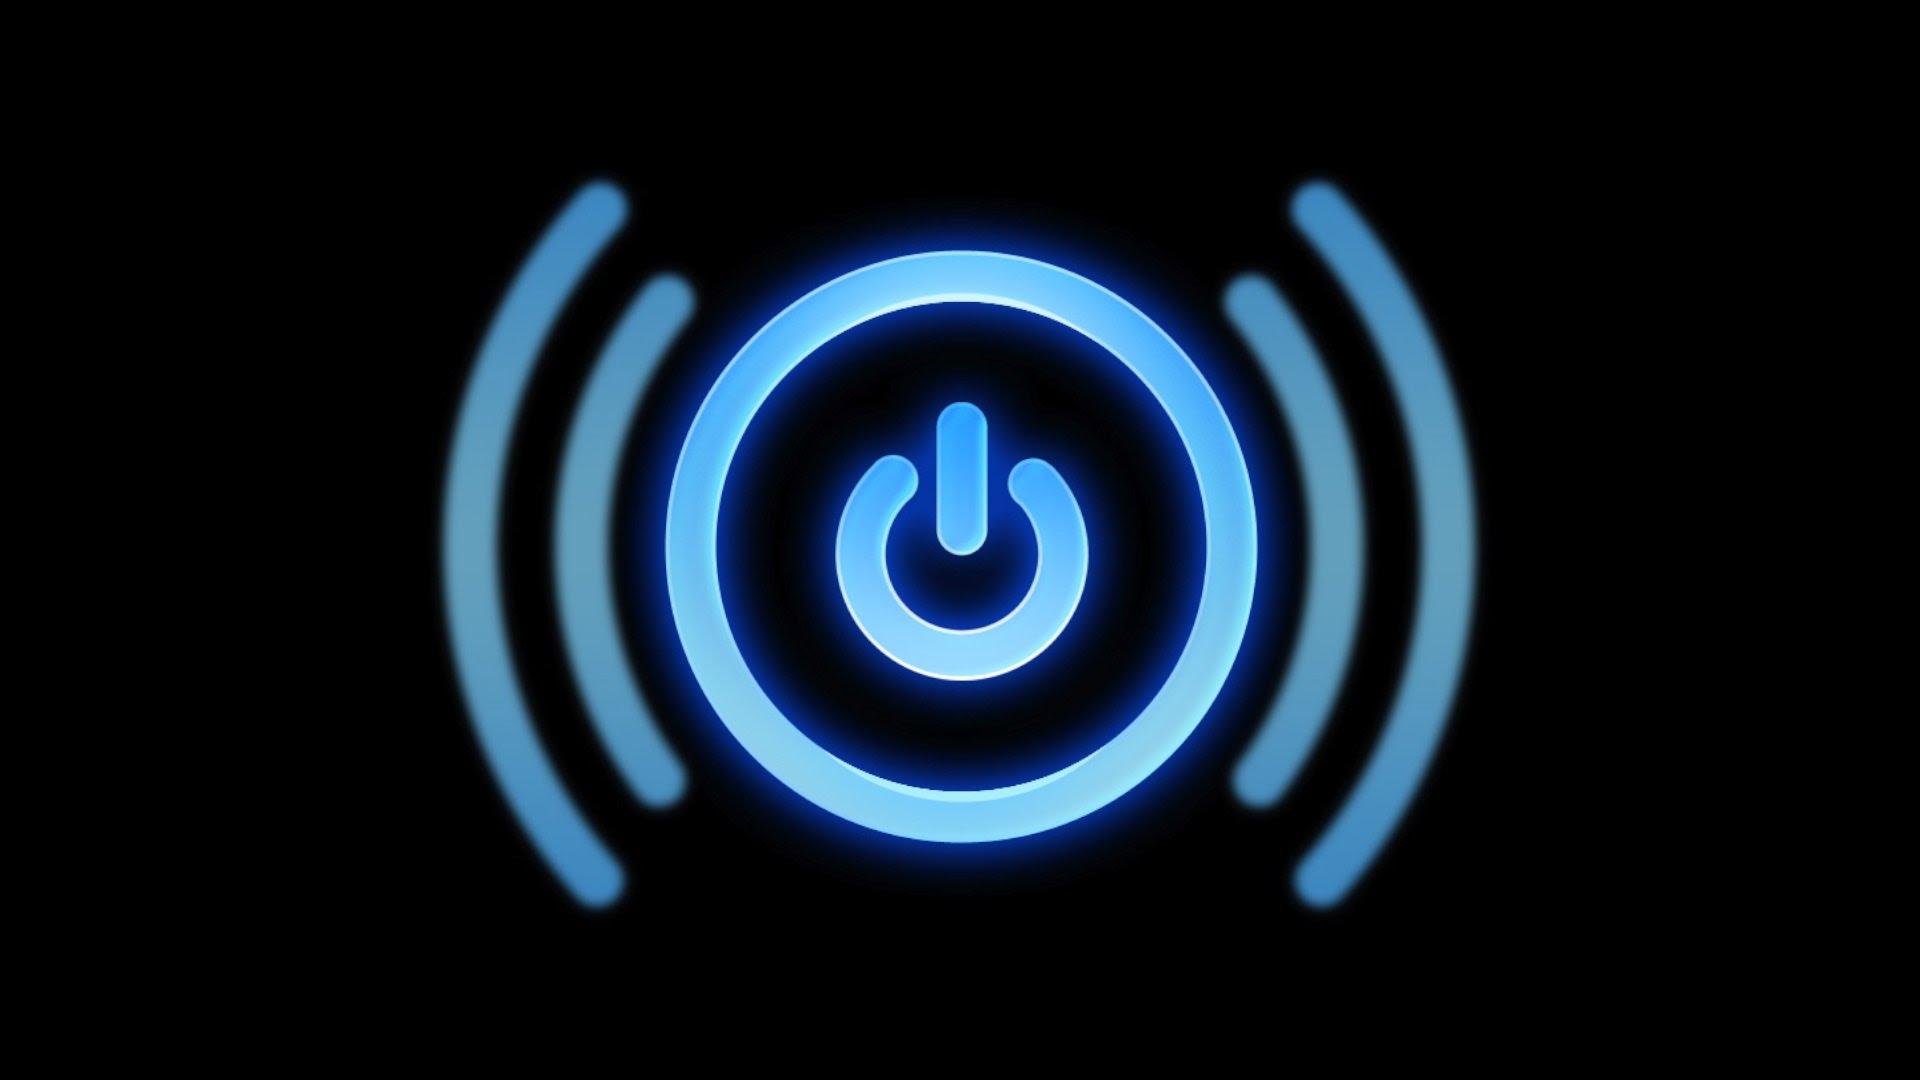 Ps3 Animated Wallpaper Wisp Wireless Power Platform News